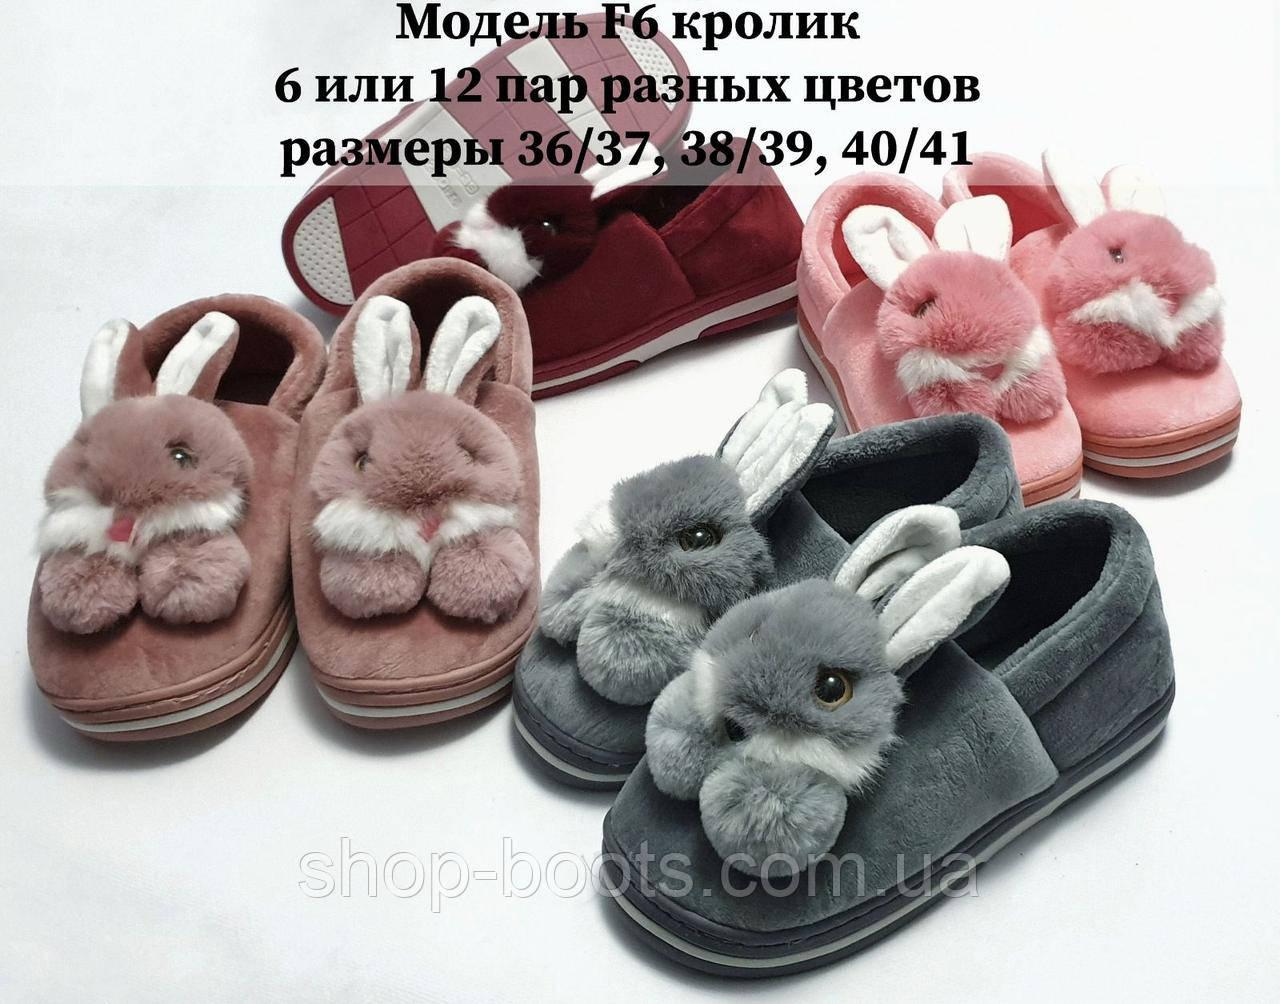 Женские тапочки оптом. 36-41рр. Модель тапочки F6 кролик